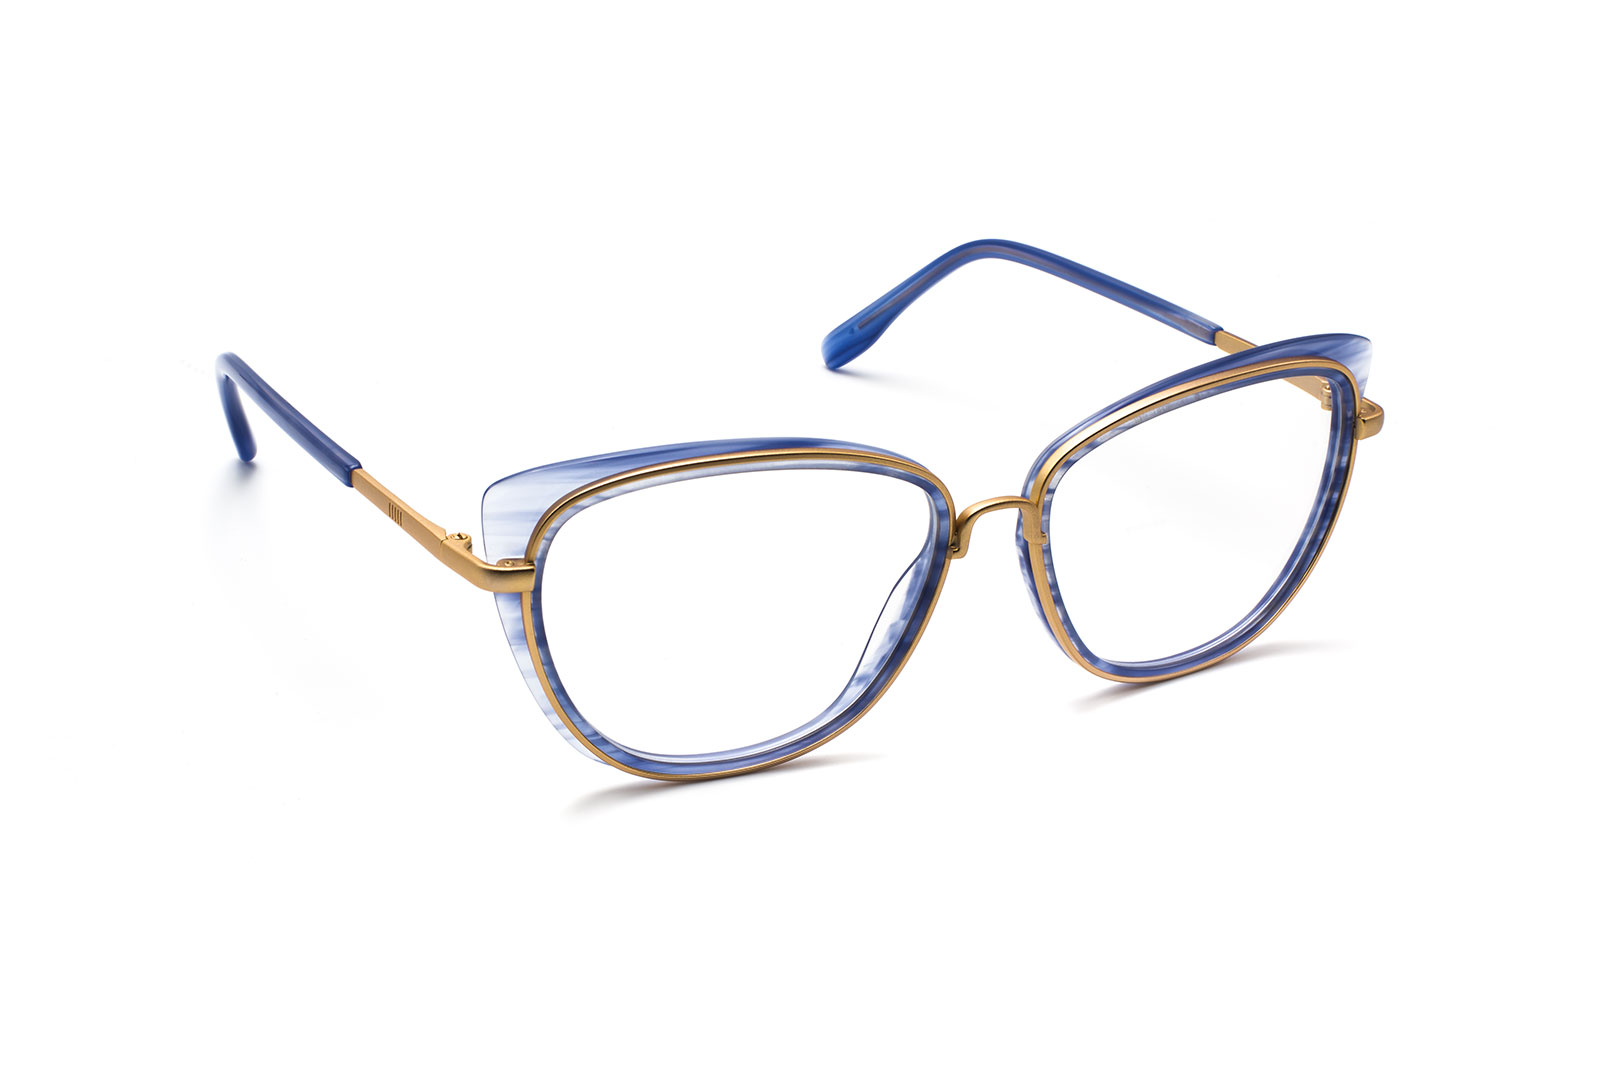 Metropolitan Eyewear: Here, Kitty Kitty!